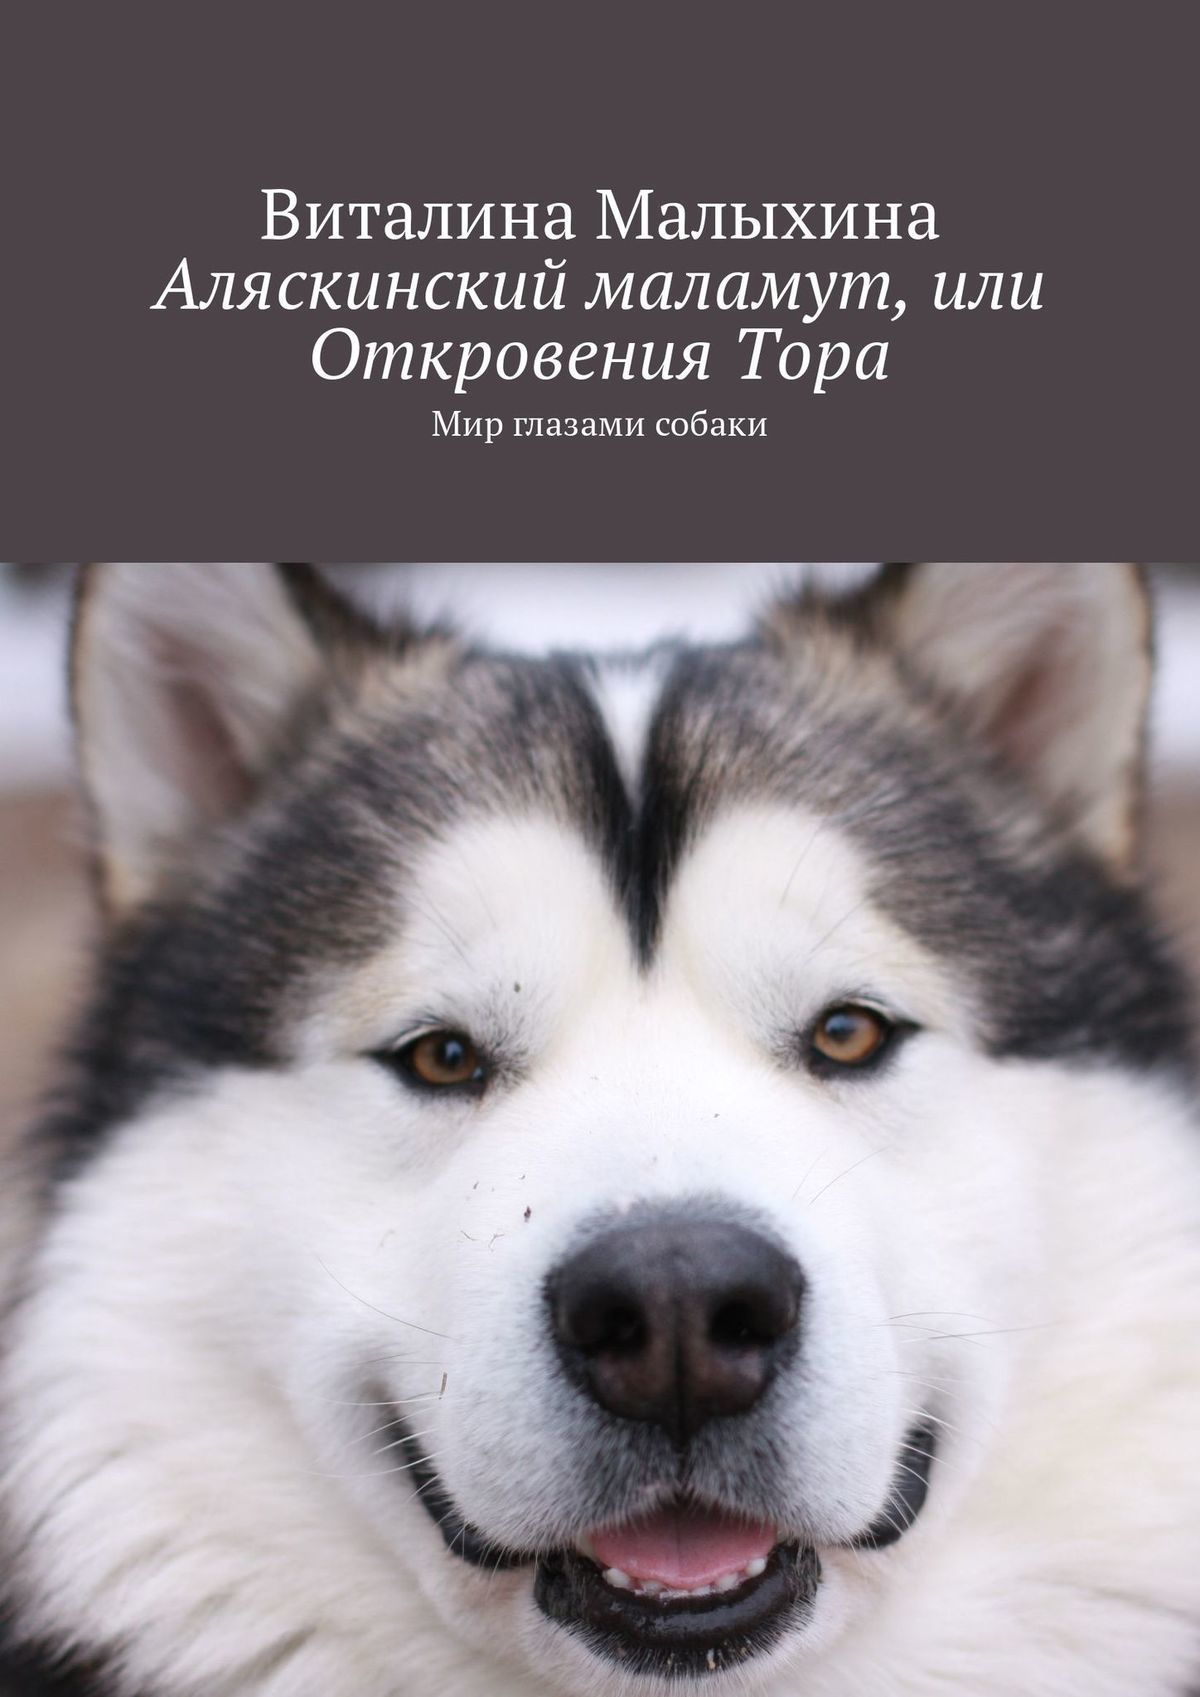 Виталина Малыхина Аляскинский маламут, или ОткровенияТора. Мир глазами собаки плащ и маска тора uni